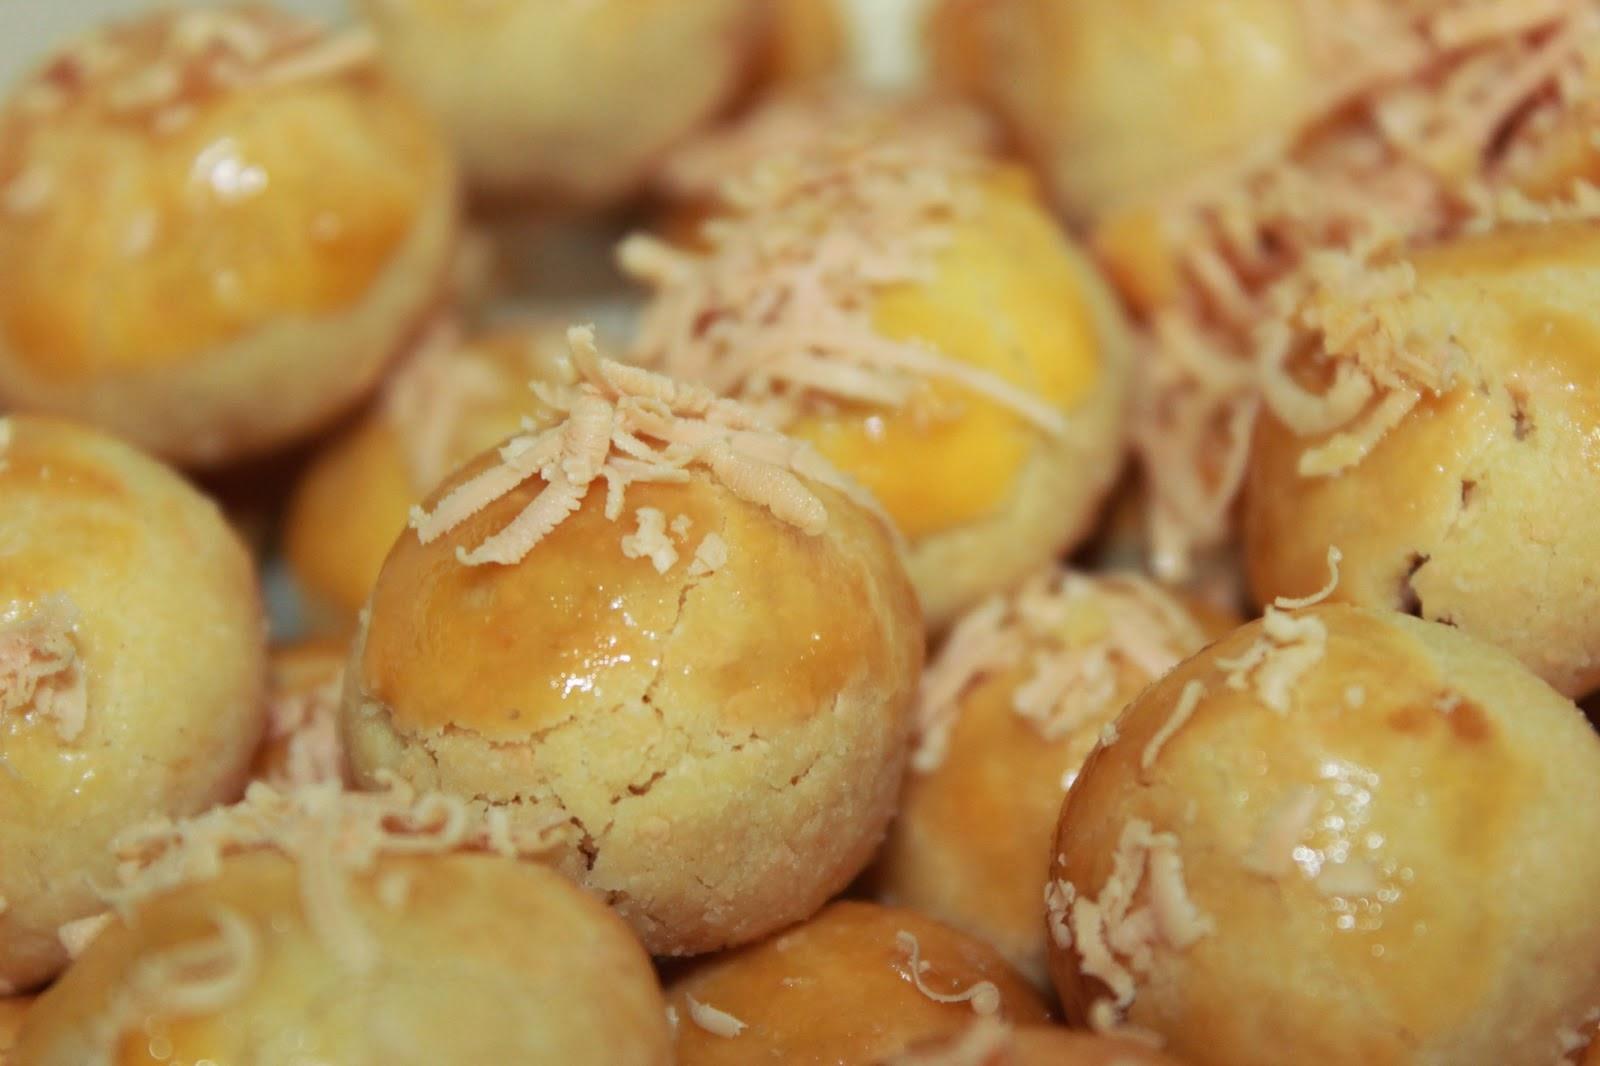 Resep kue nastar renyah rasa kacang di hari raya sajian indonesia